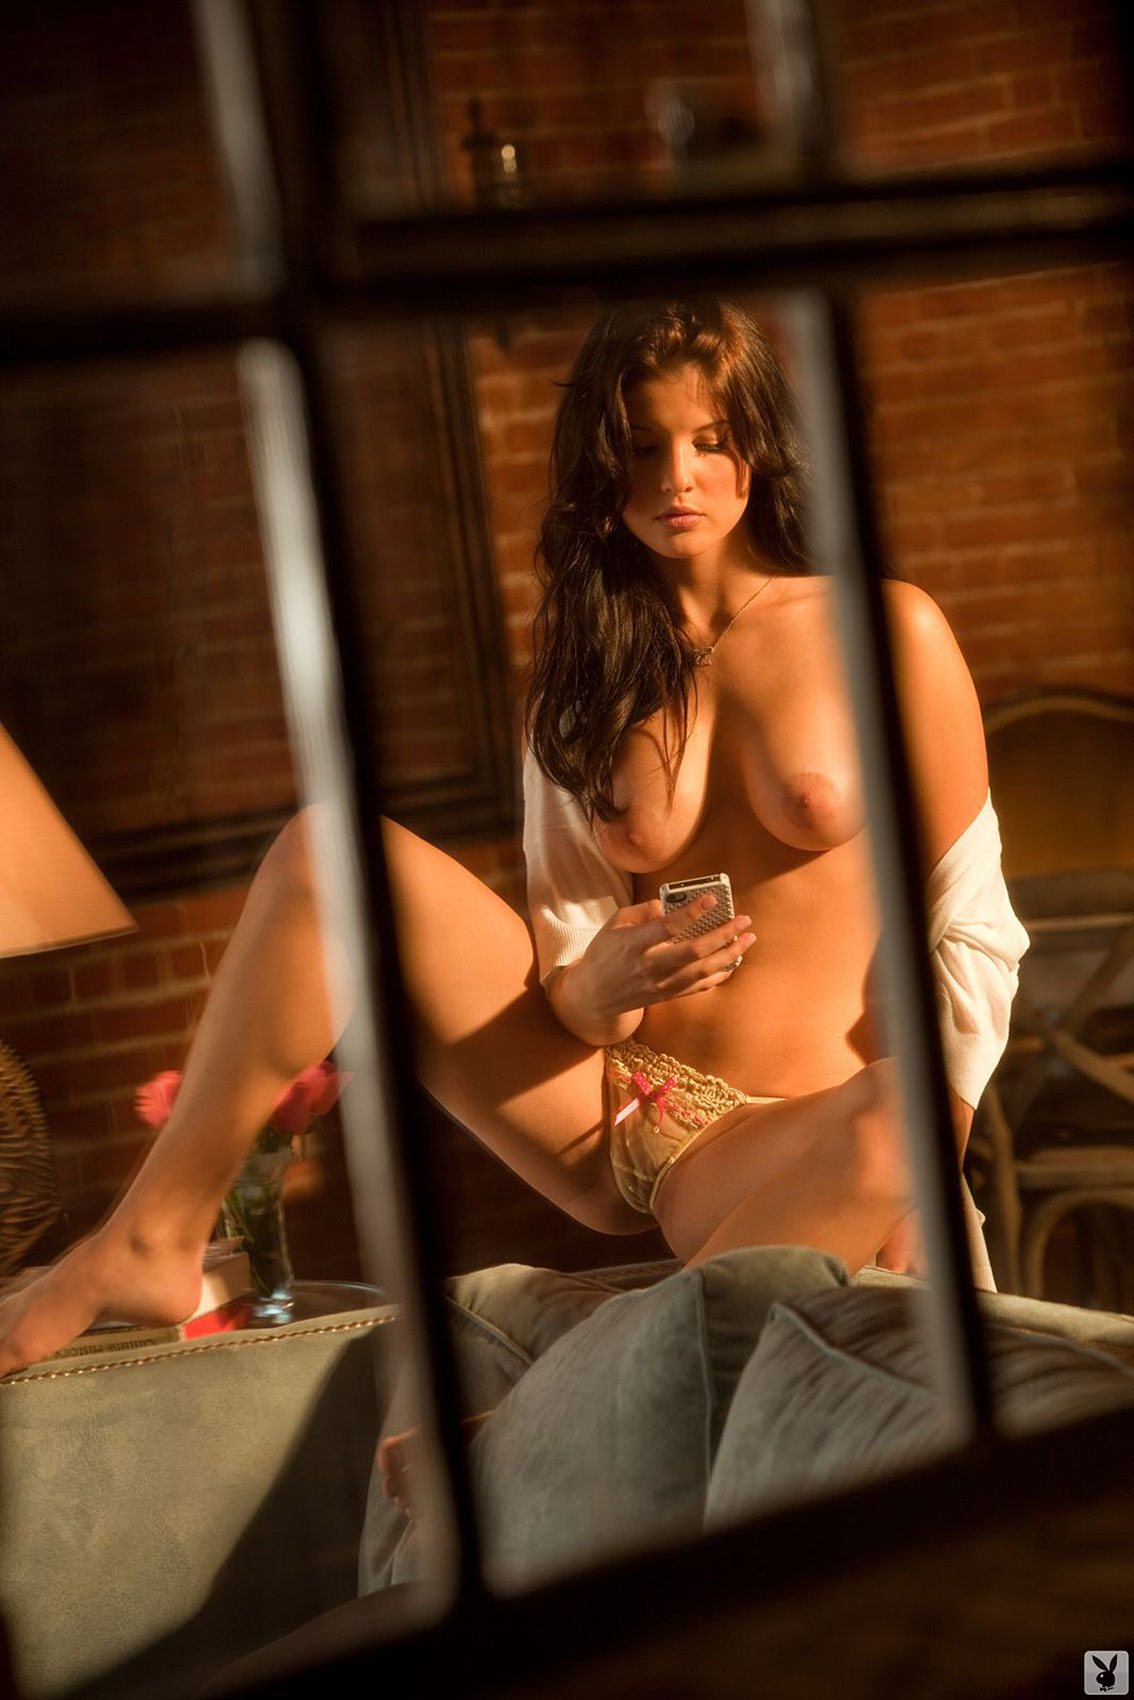 Amanda Cerny Video Porn amanda cerny nude pussy and ass scandal planet   free hot